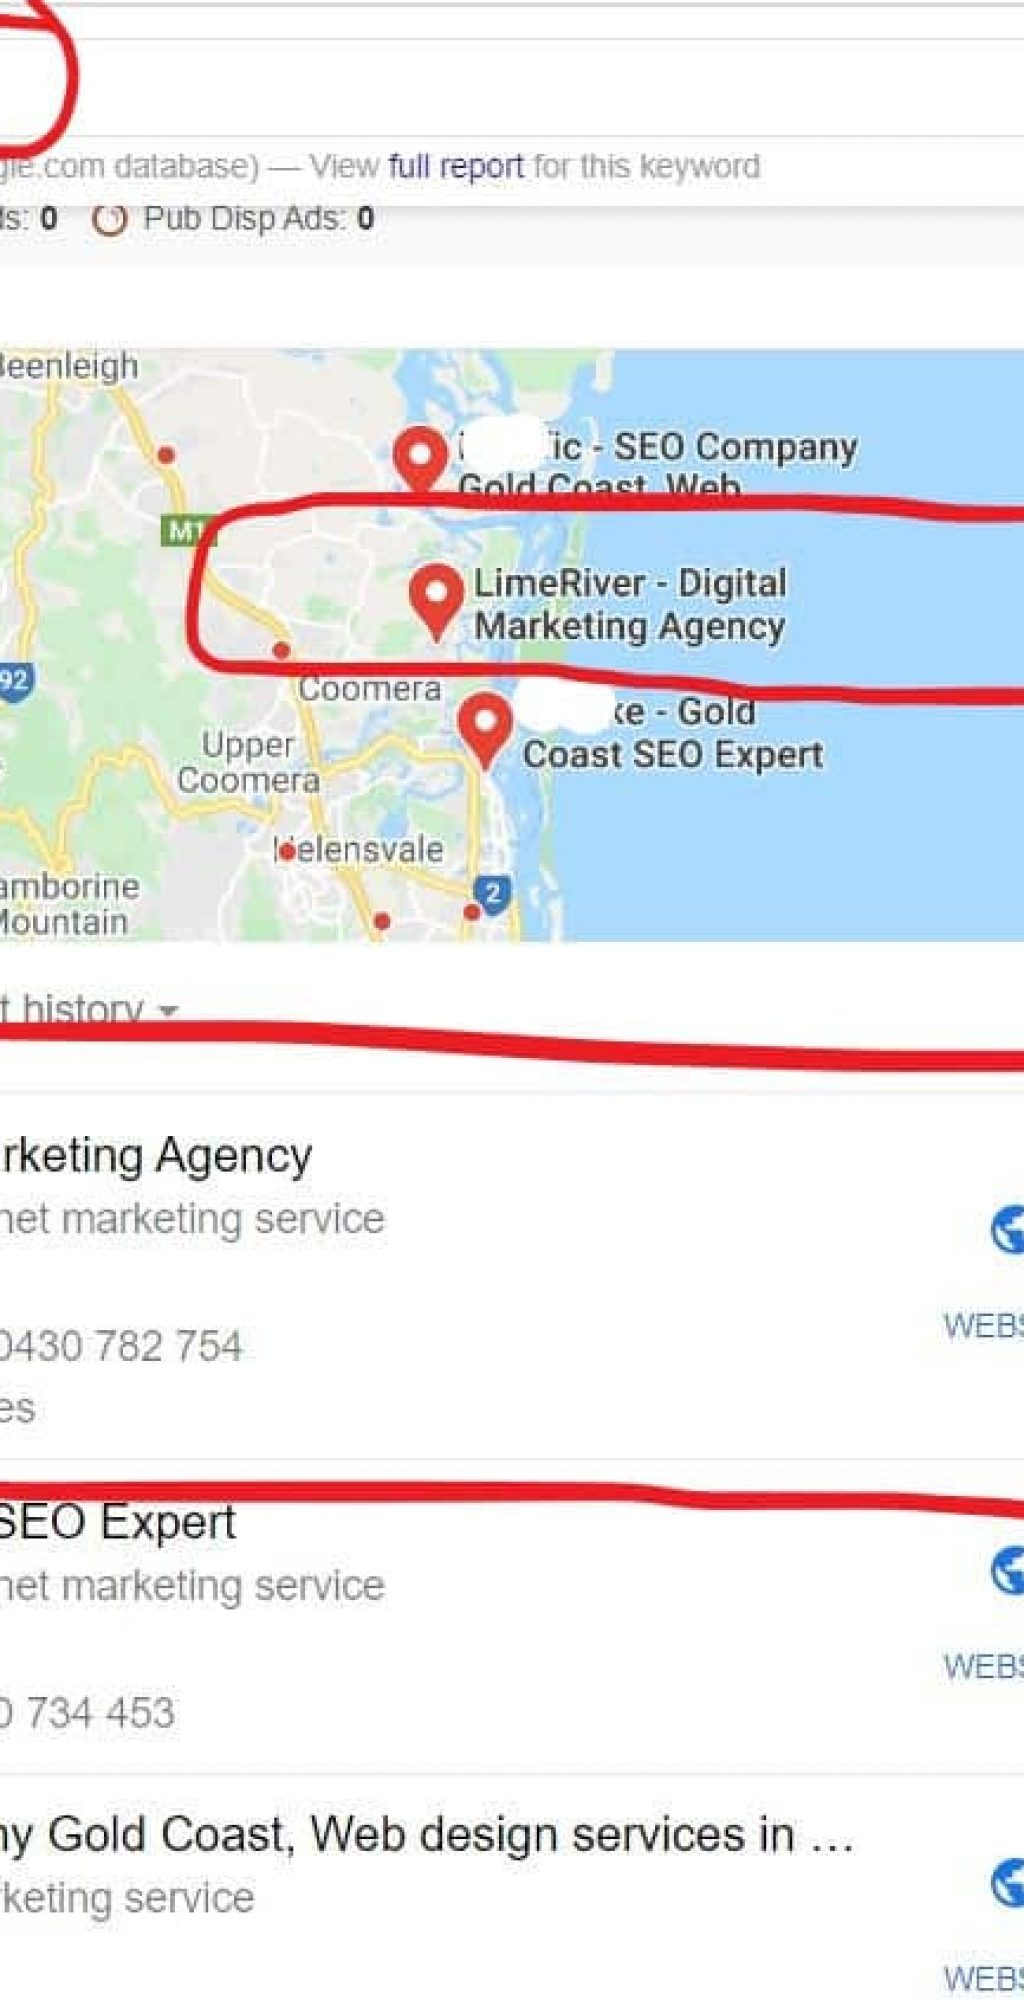 #1 Local SEO Agency